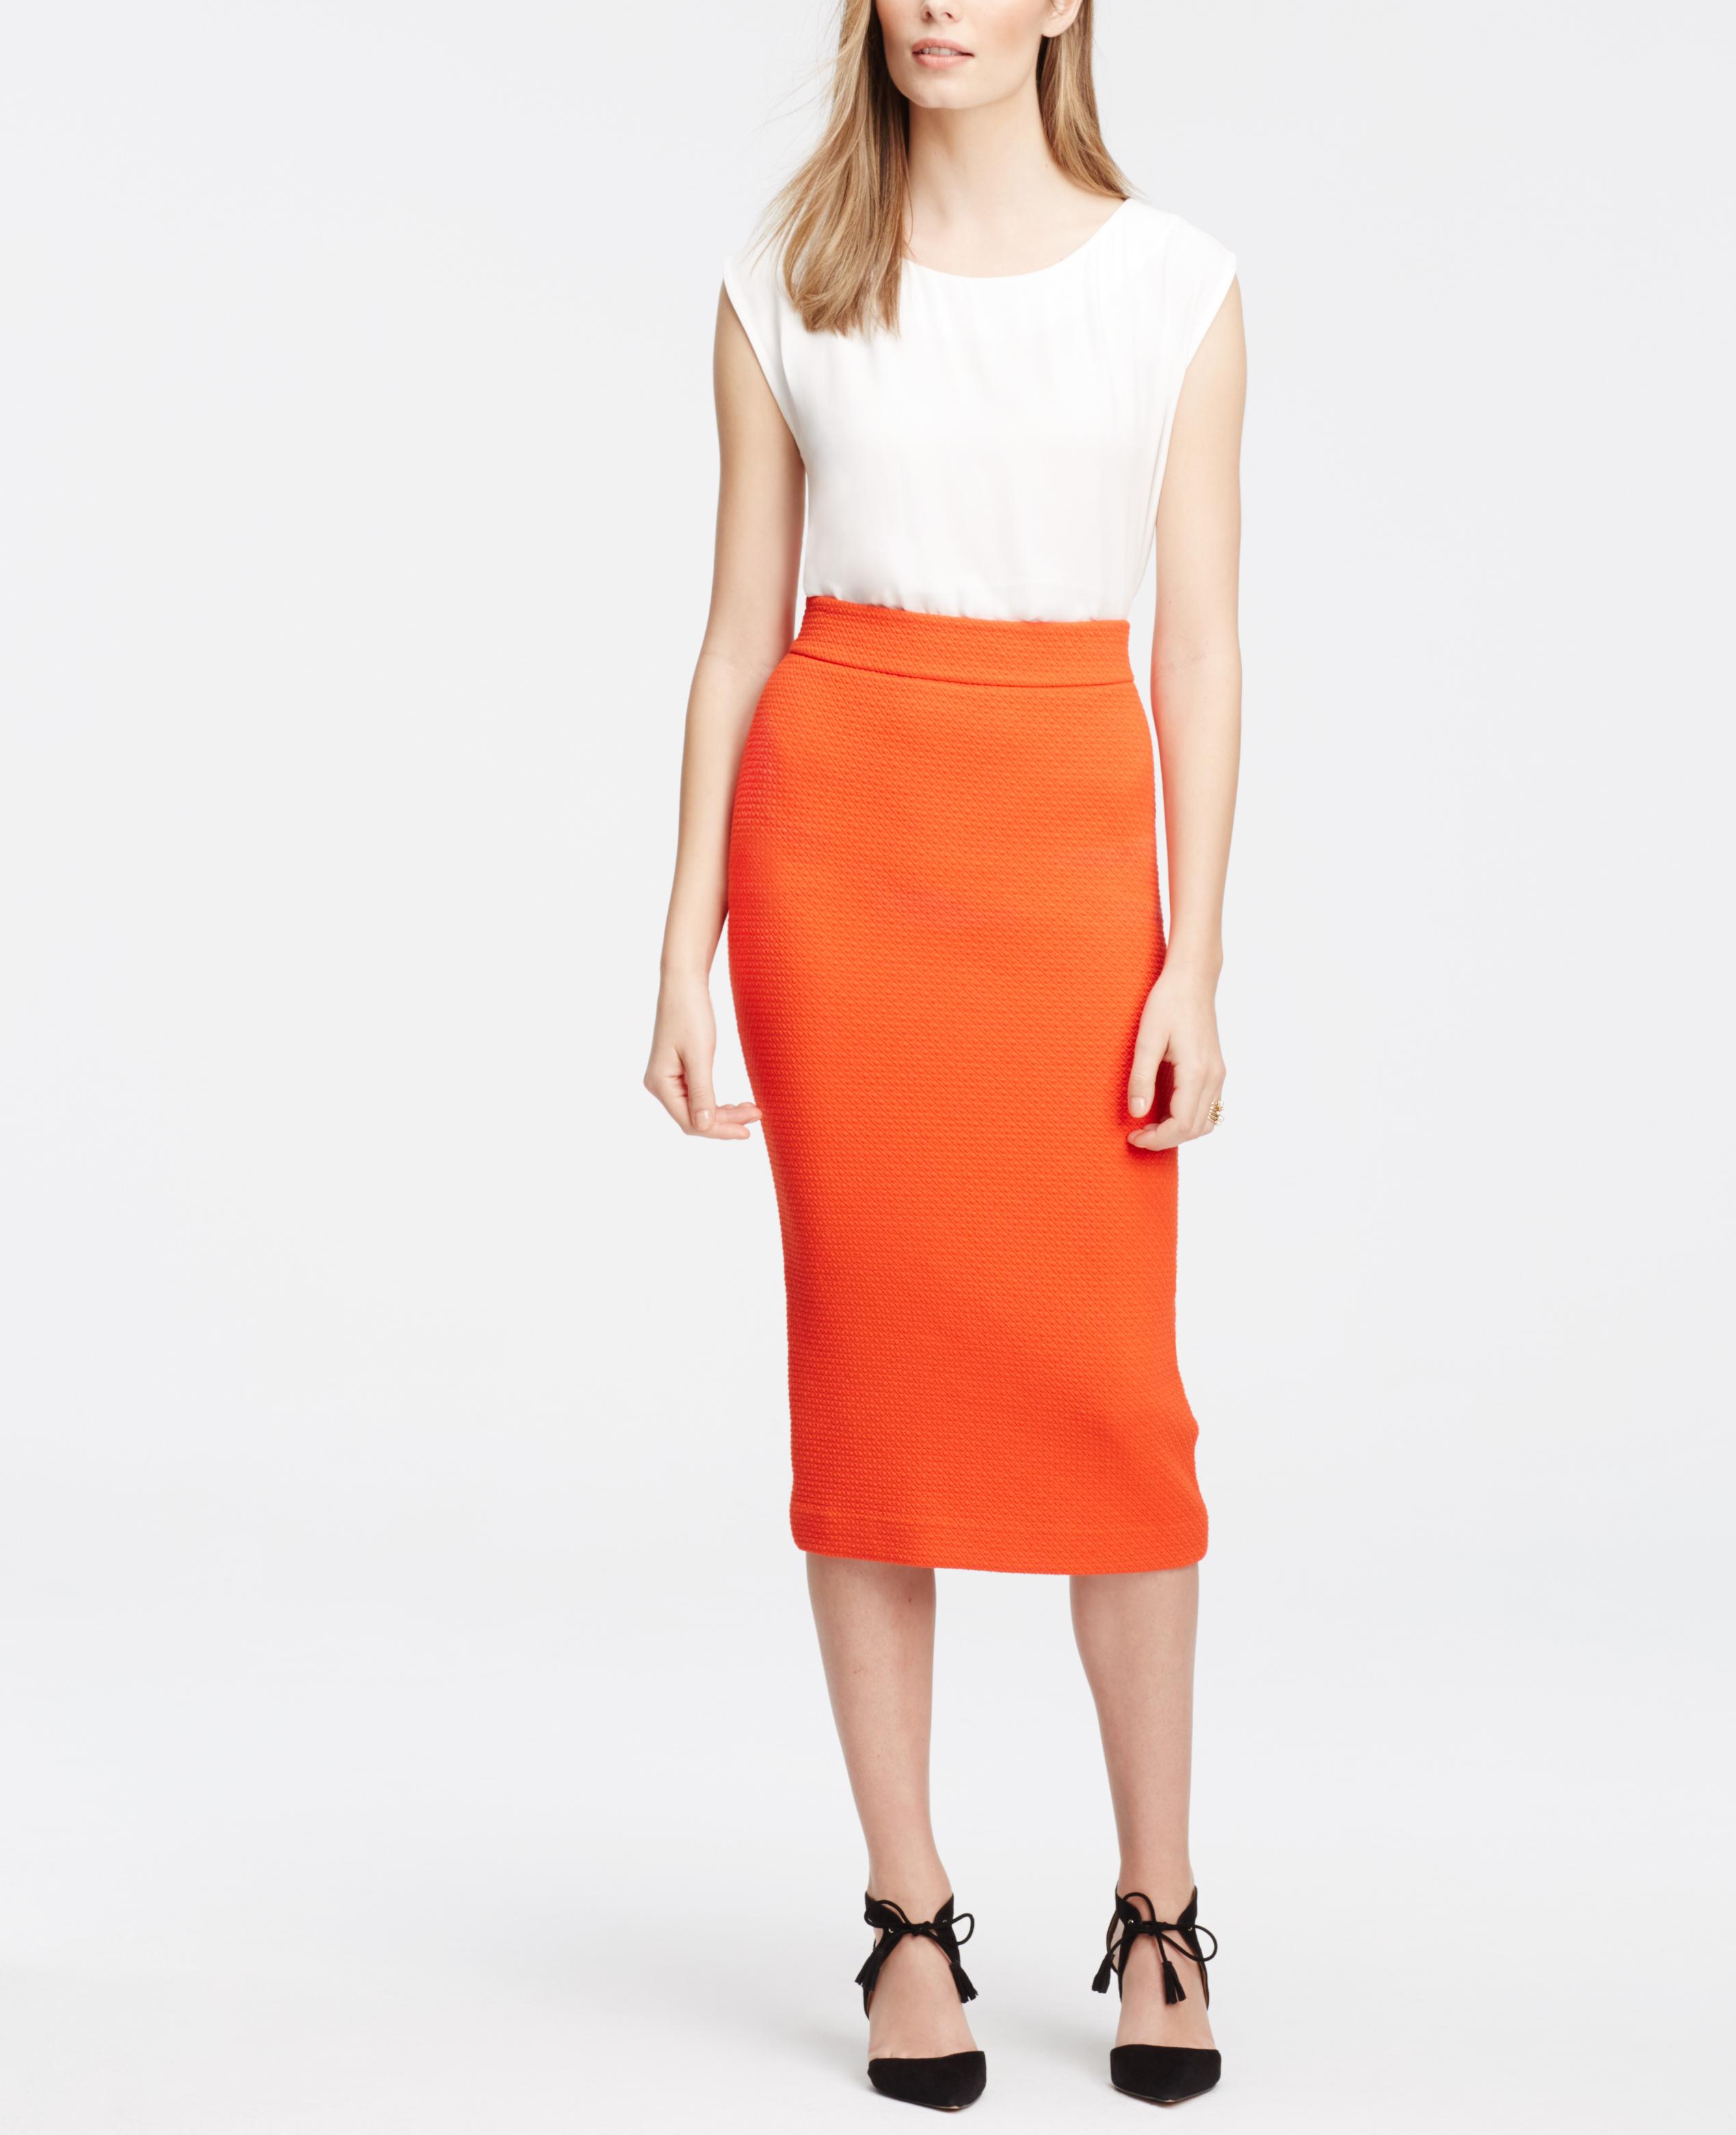 Orange Pencil Skirt - Dress Ala